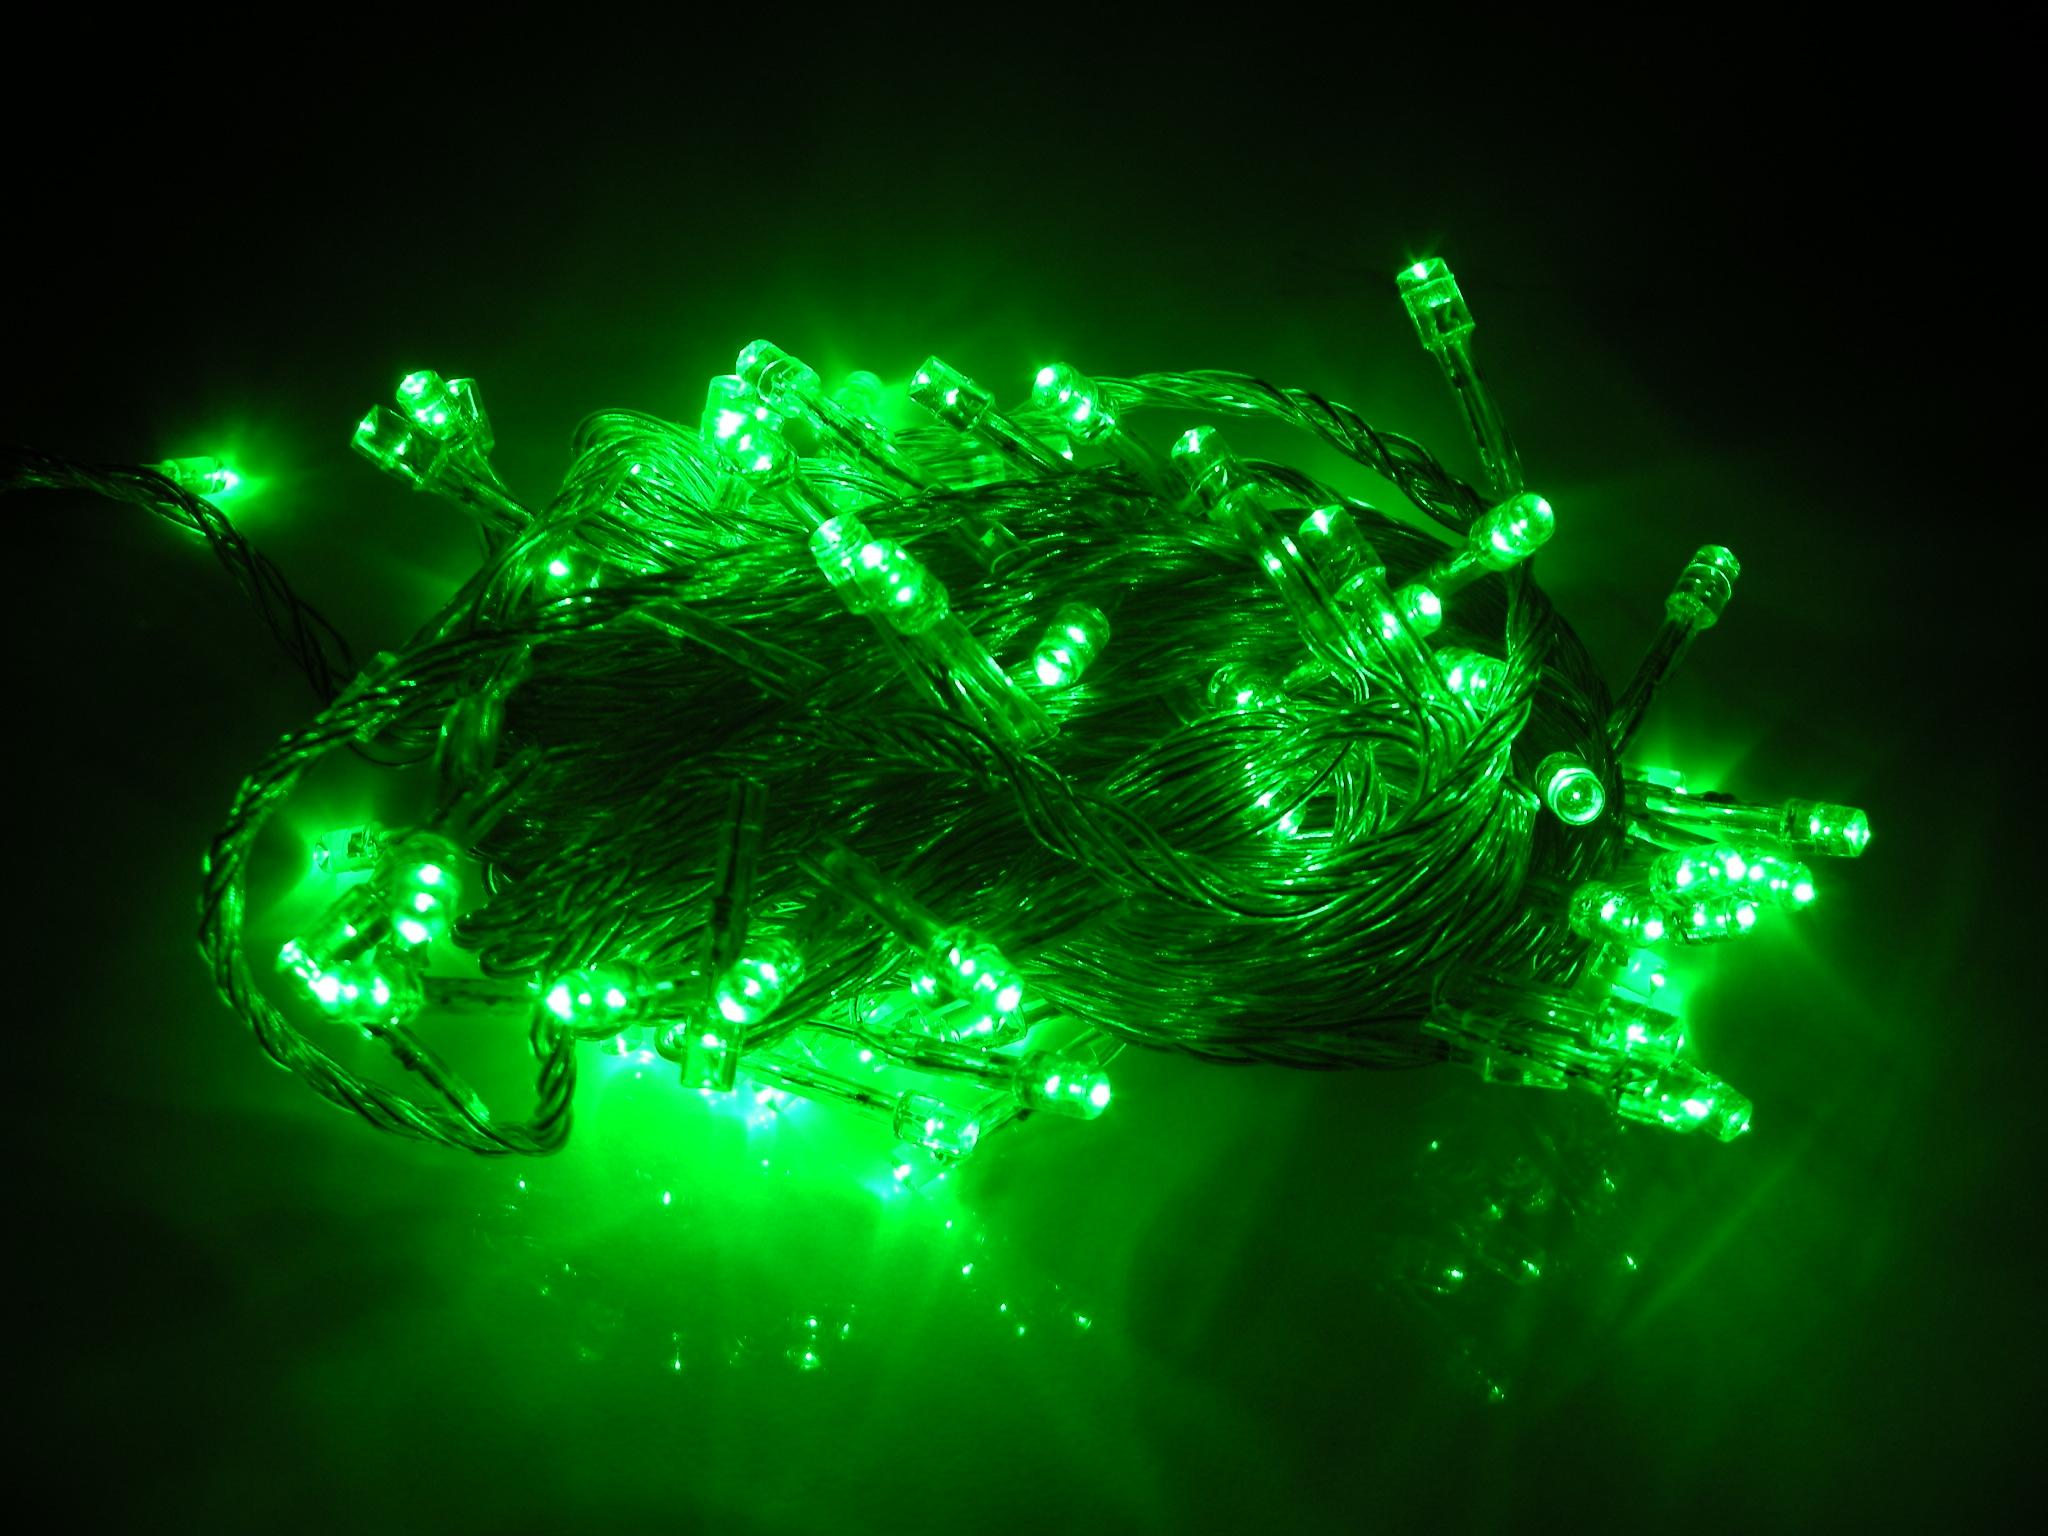 led lichterkette 100 leds 10m weihnachten party kette leuchte lichterband top ebay. Black Bedroom Furniture Sets. Home Design Ideas